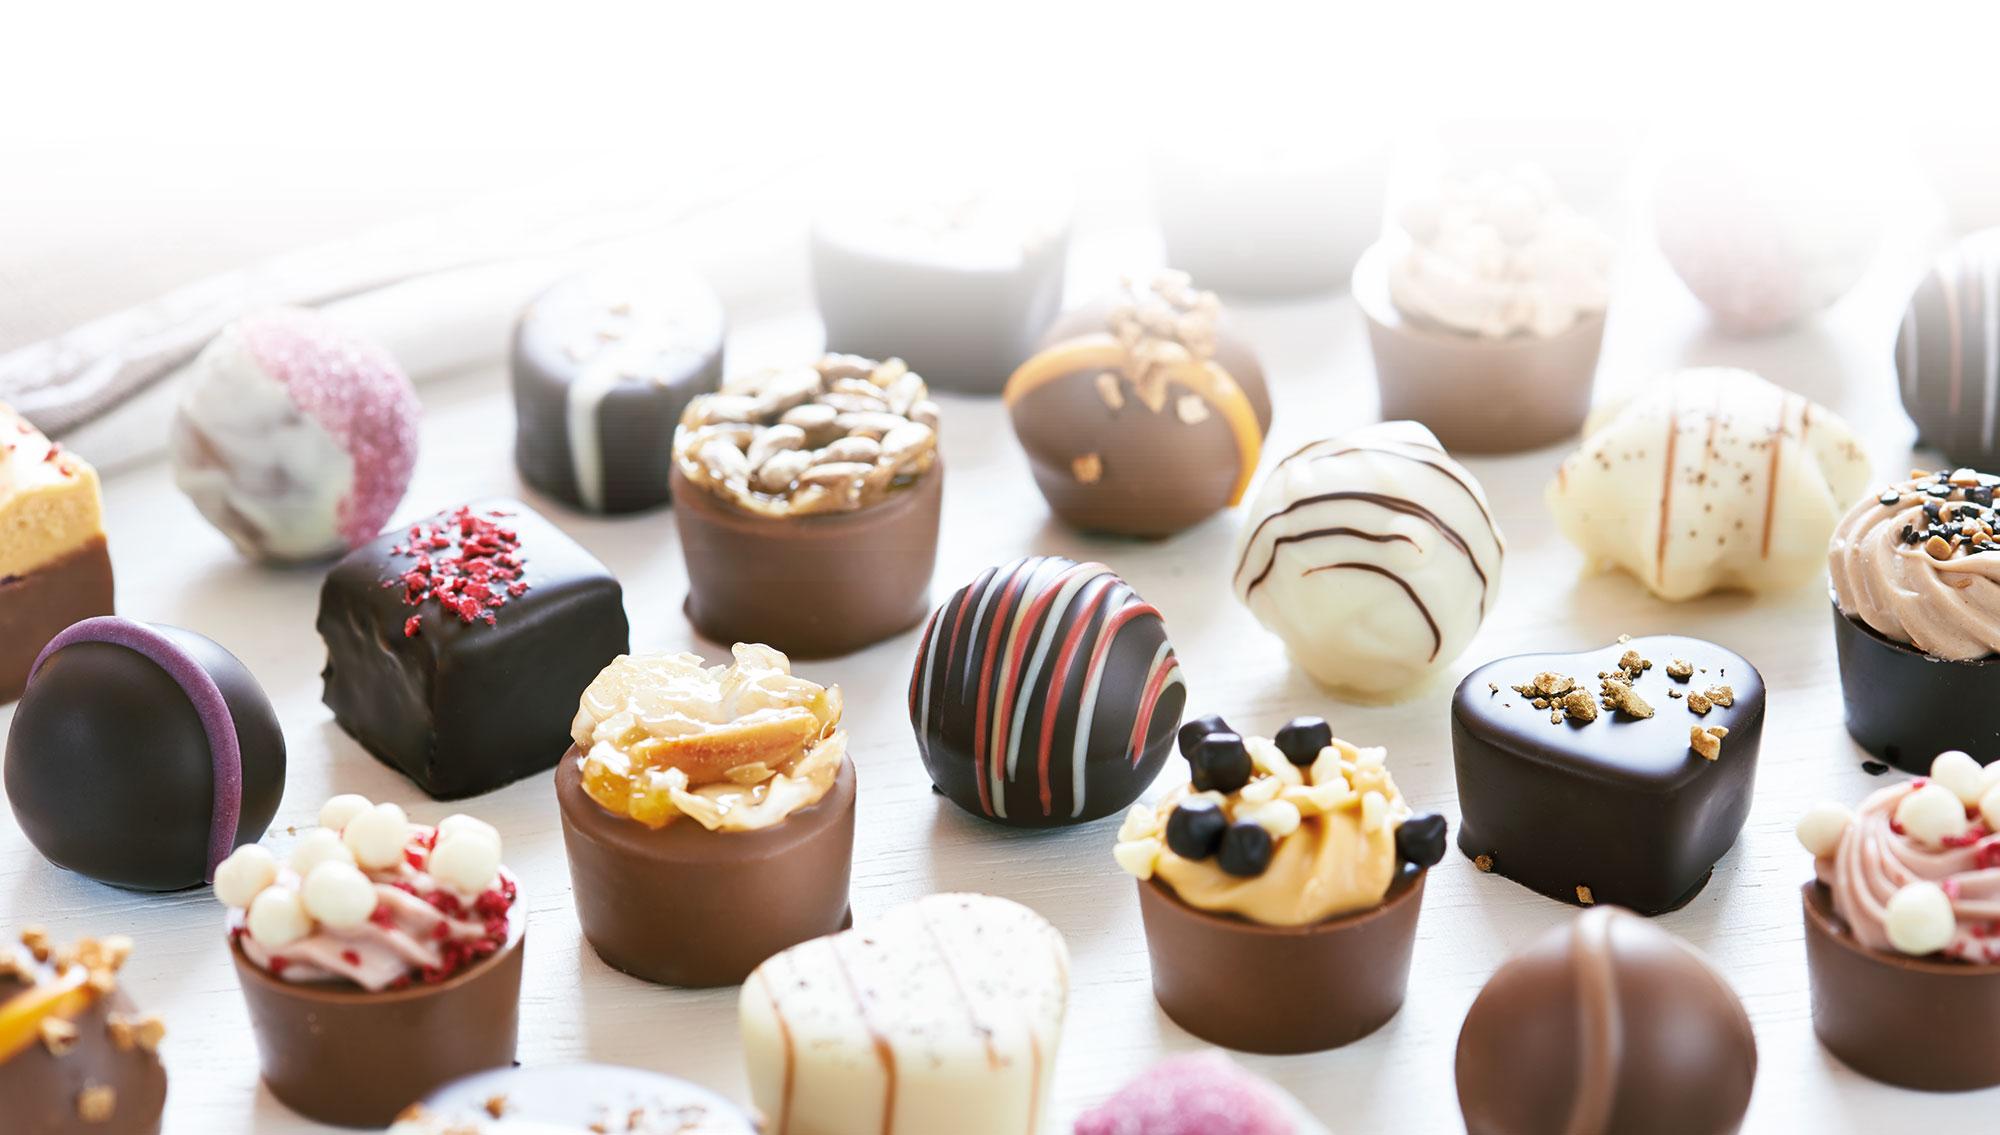 Pralinen, Trüffel, Schokolade, Schokoladenfiguren, Pralinenmanufactur Große Bölting Rhede, Adventskalender online